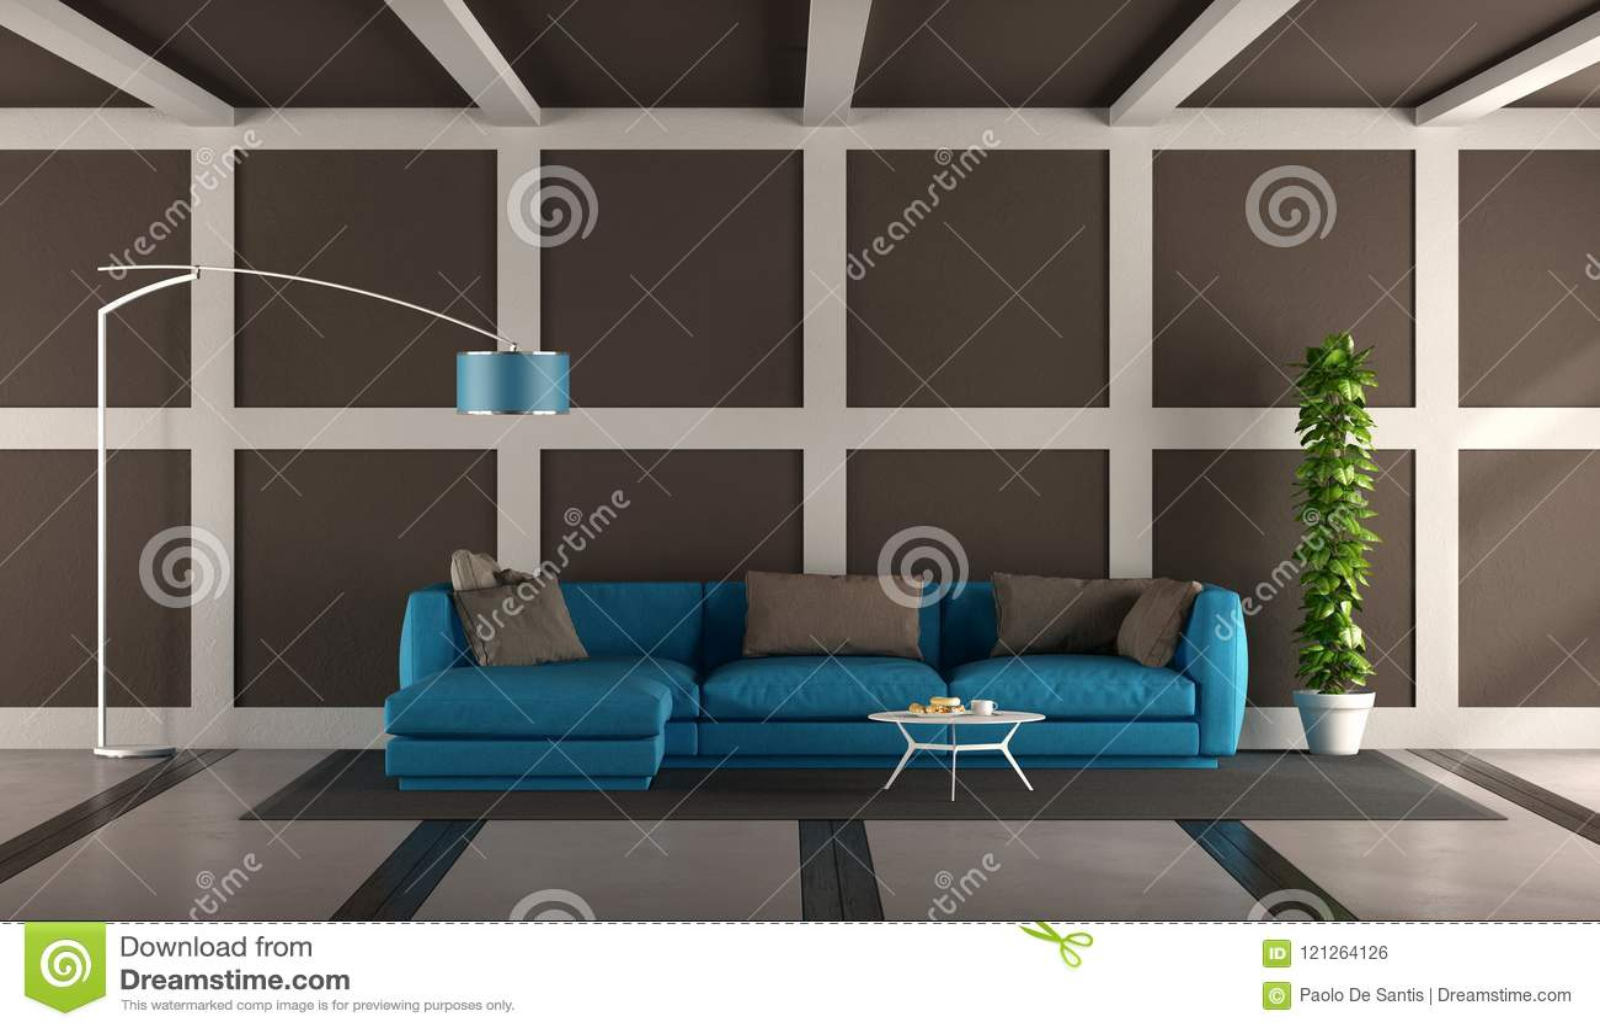 Blue And Brown Modern Living Room Stock Illustration